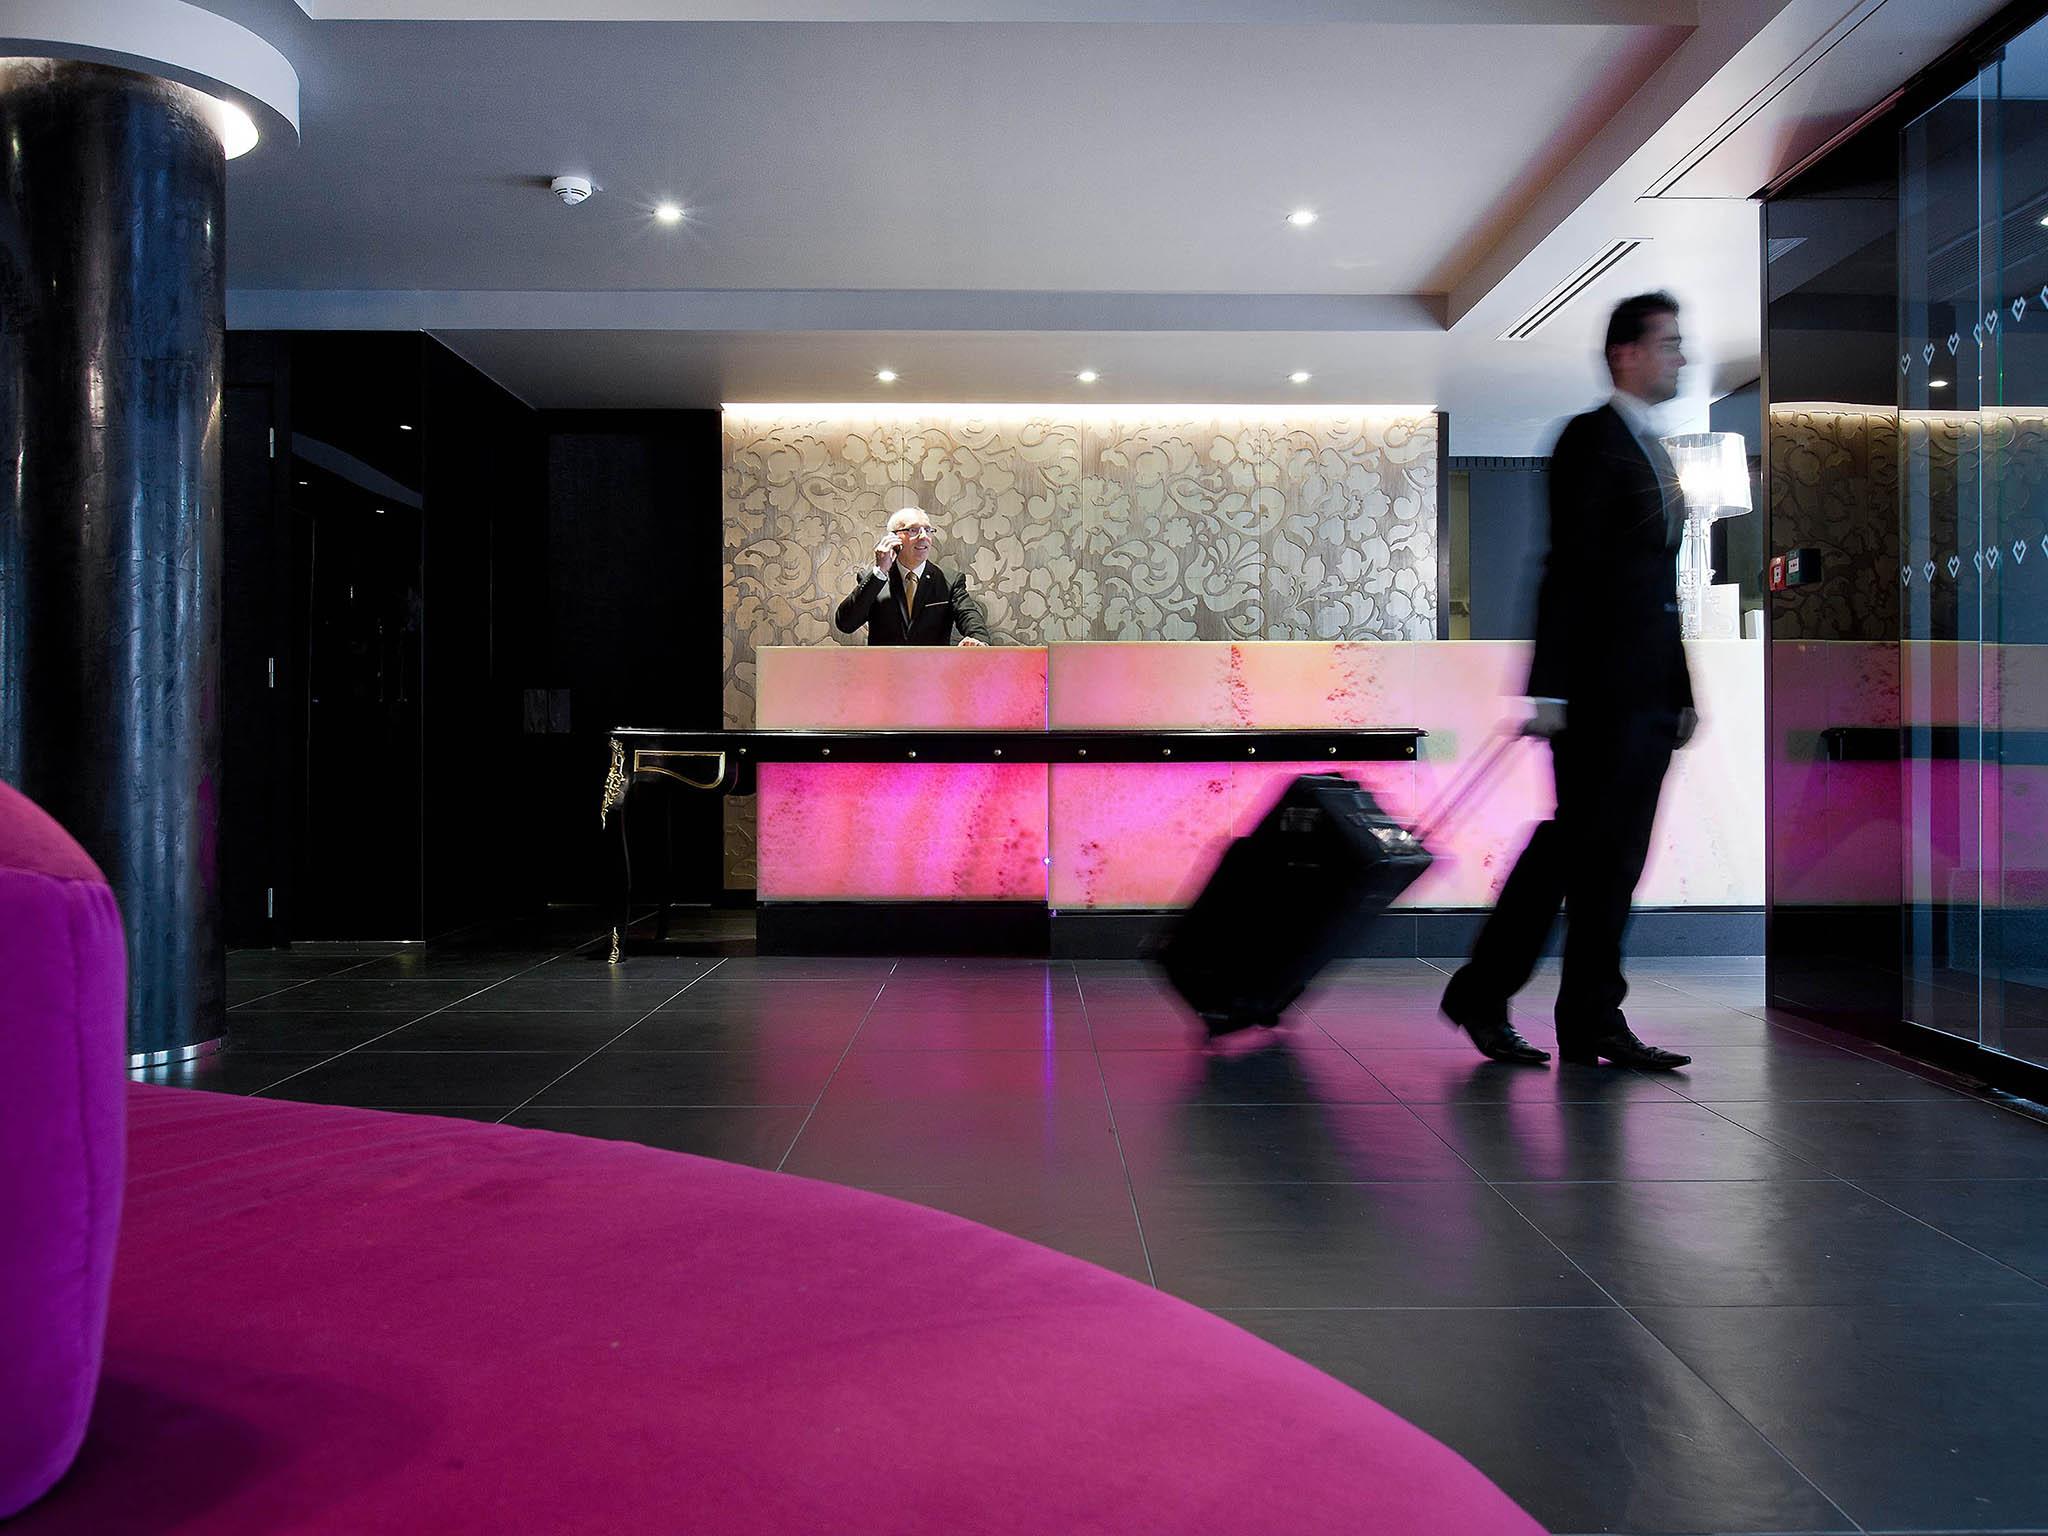 hotel in paris - la villa maillot arc de triomphe